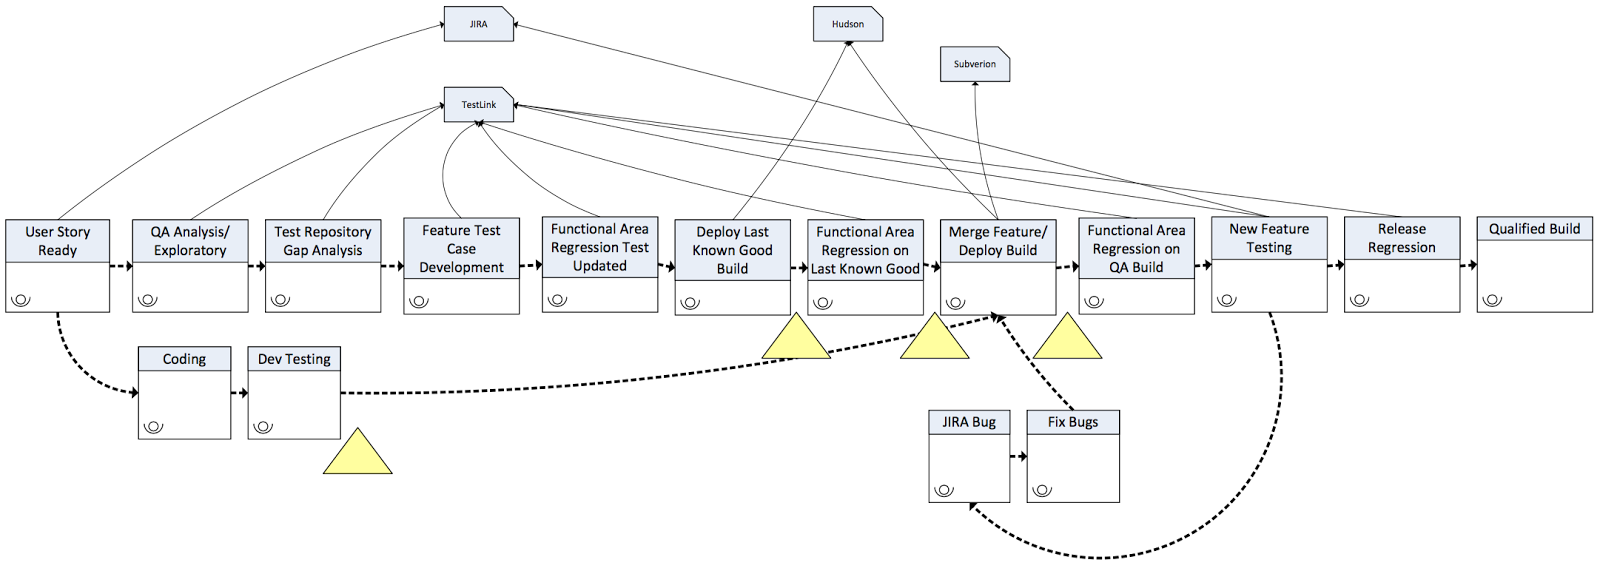 process flow diagram template visio 2010